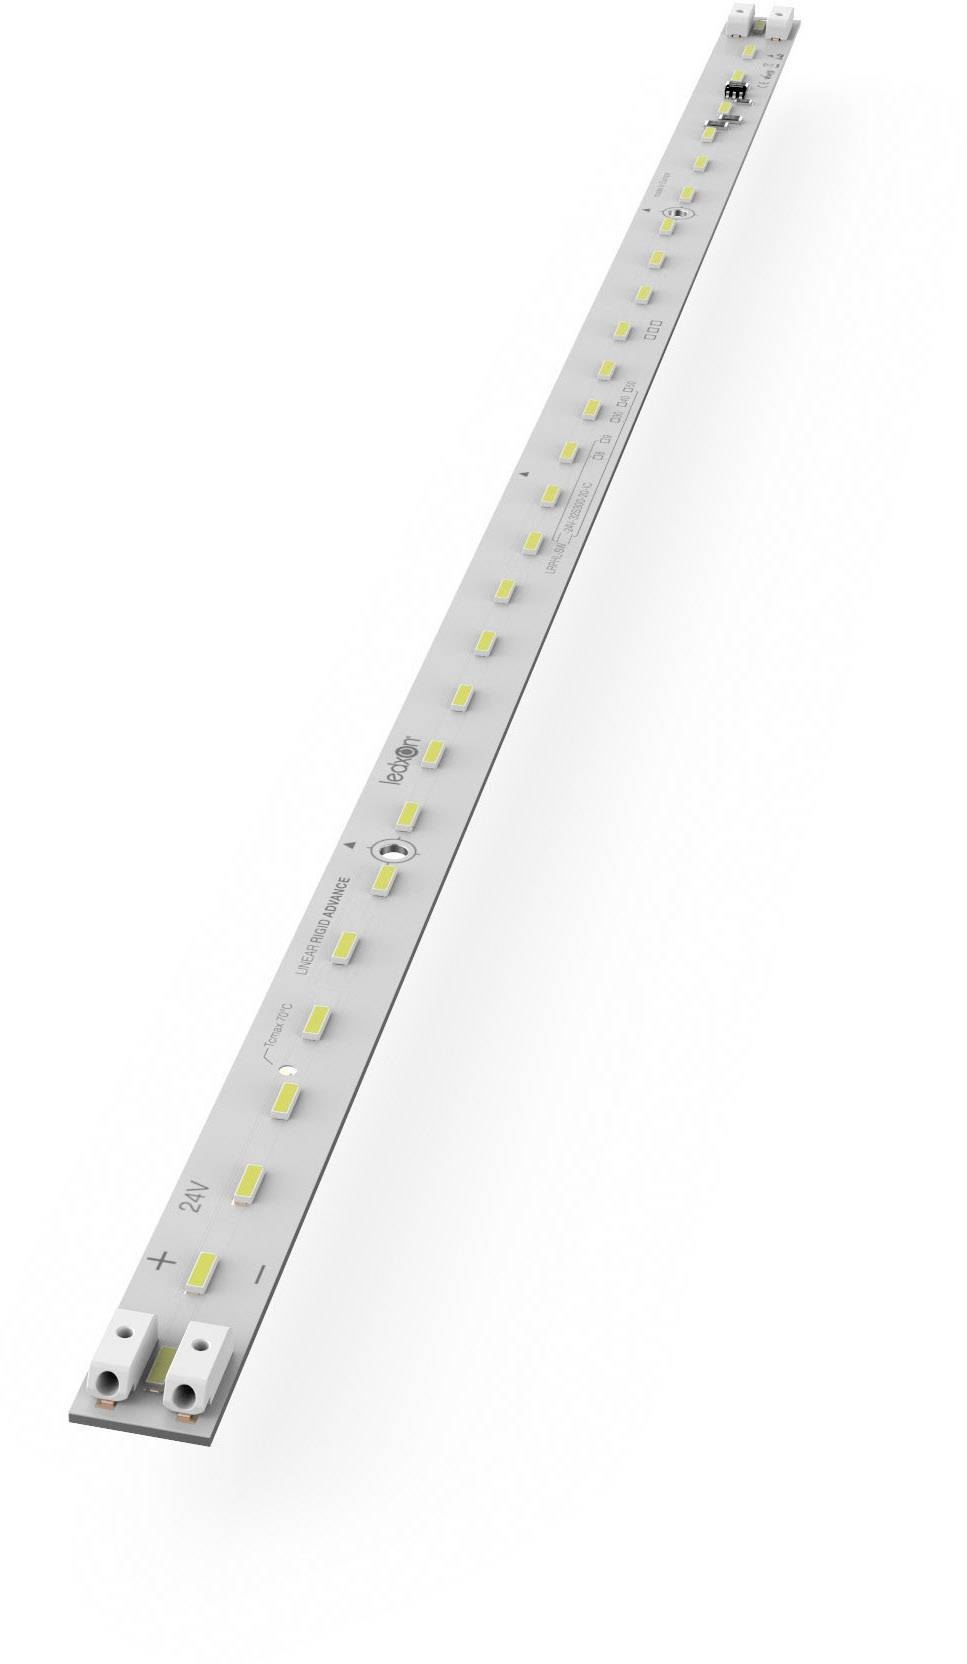 LED lišta ledxon LRAML-SW950-24V-28S103-20-IC 9009371, 24 V, studená bílá, 30 cm